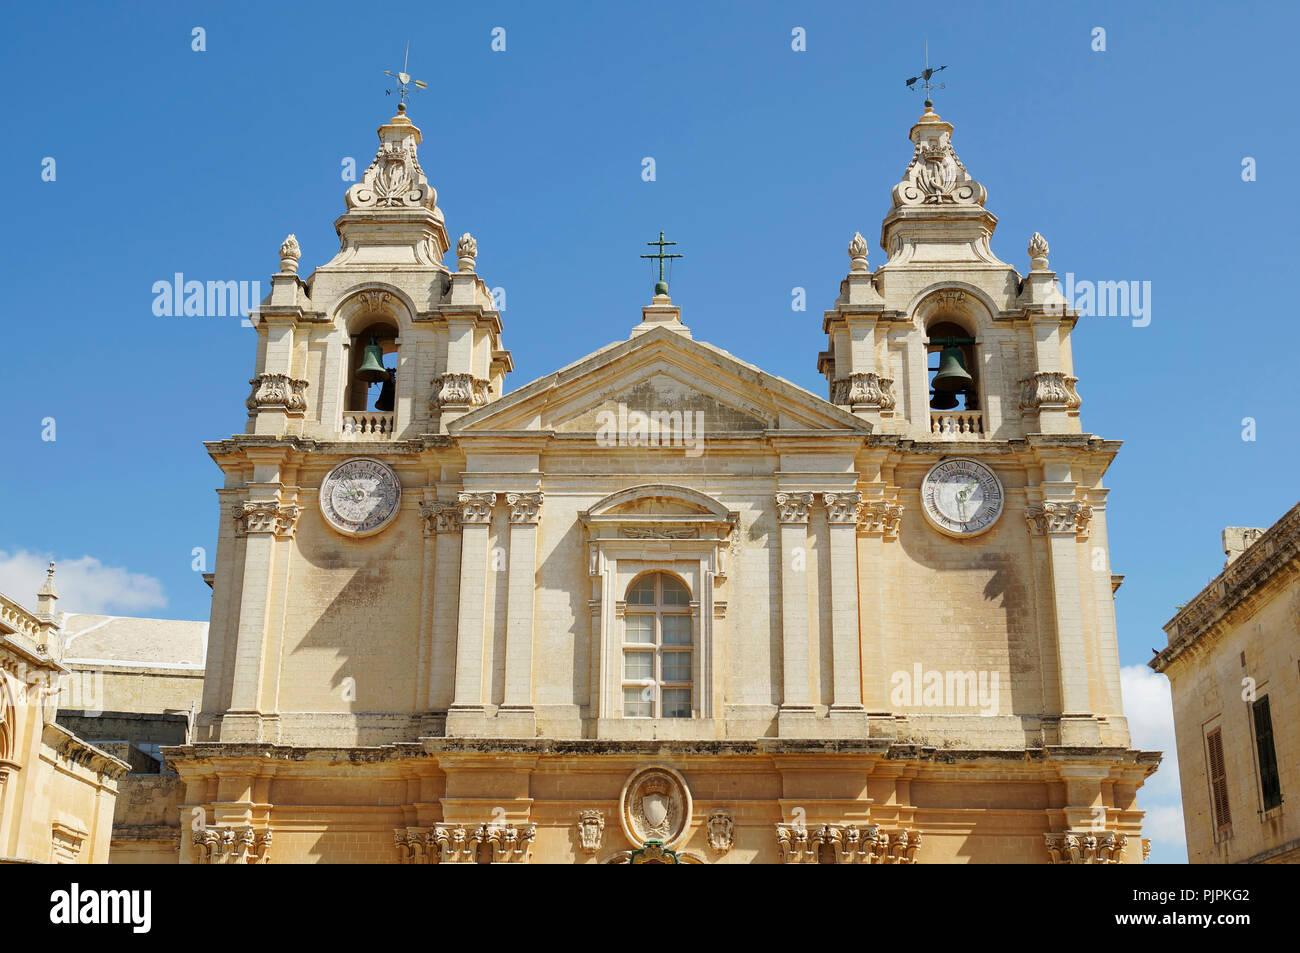 La Cathédrale St Paul à Mdina, Malte Photo Stock